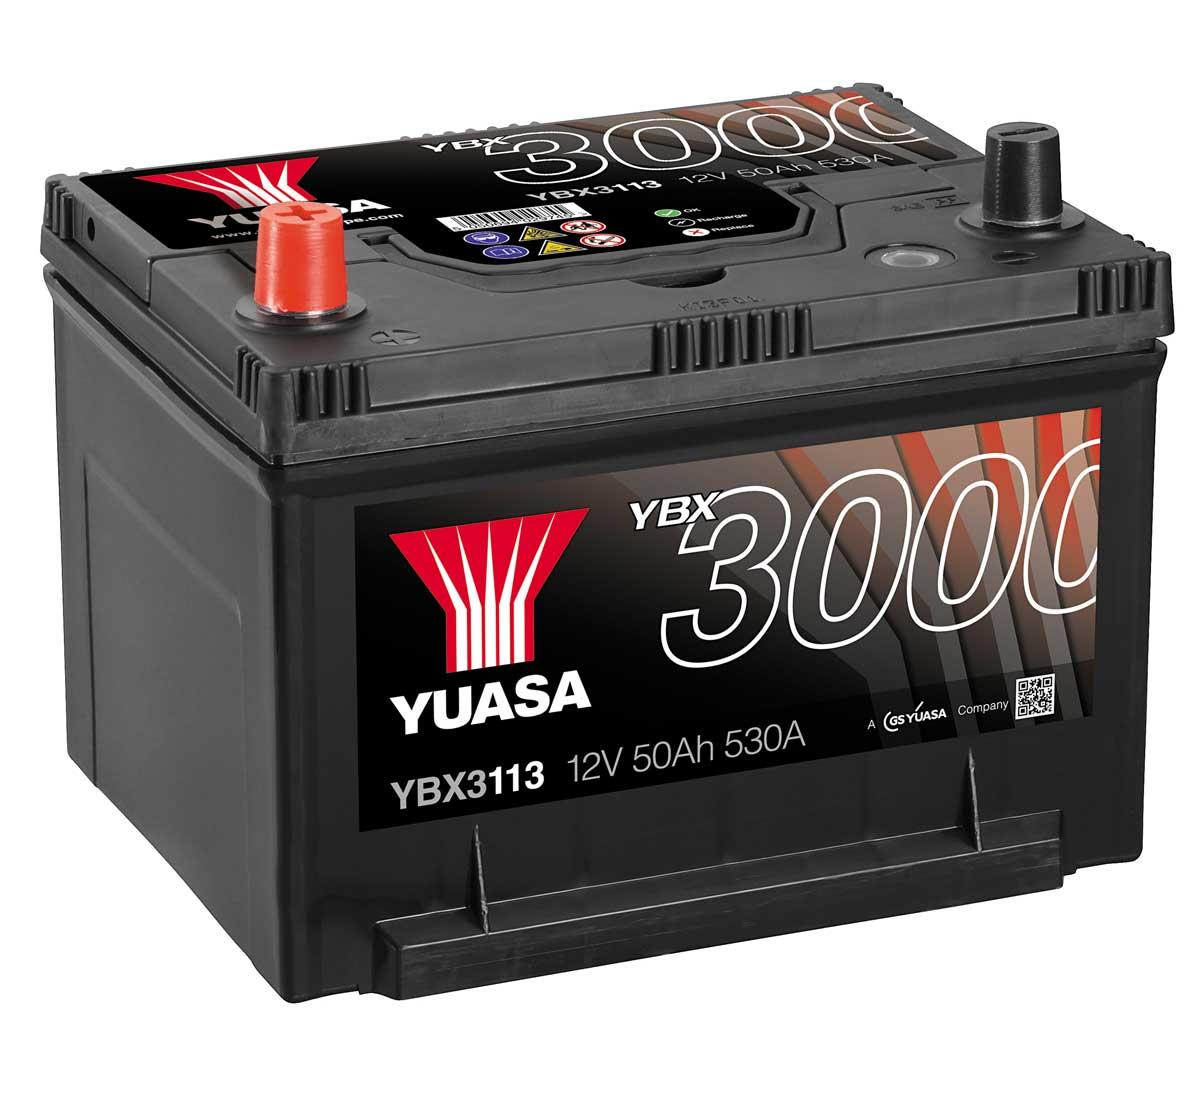 yuasa ybx3113 12v car battery mds battery. Black Bedroom Furniture Sets. Home Design Ideas